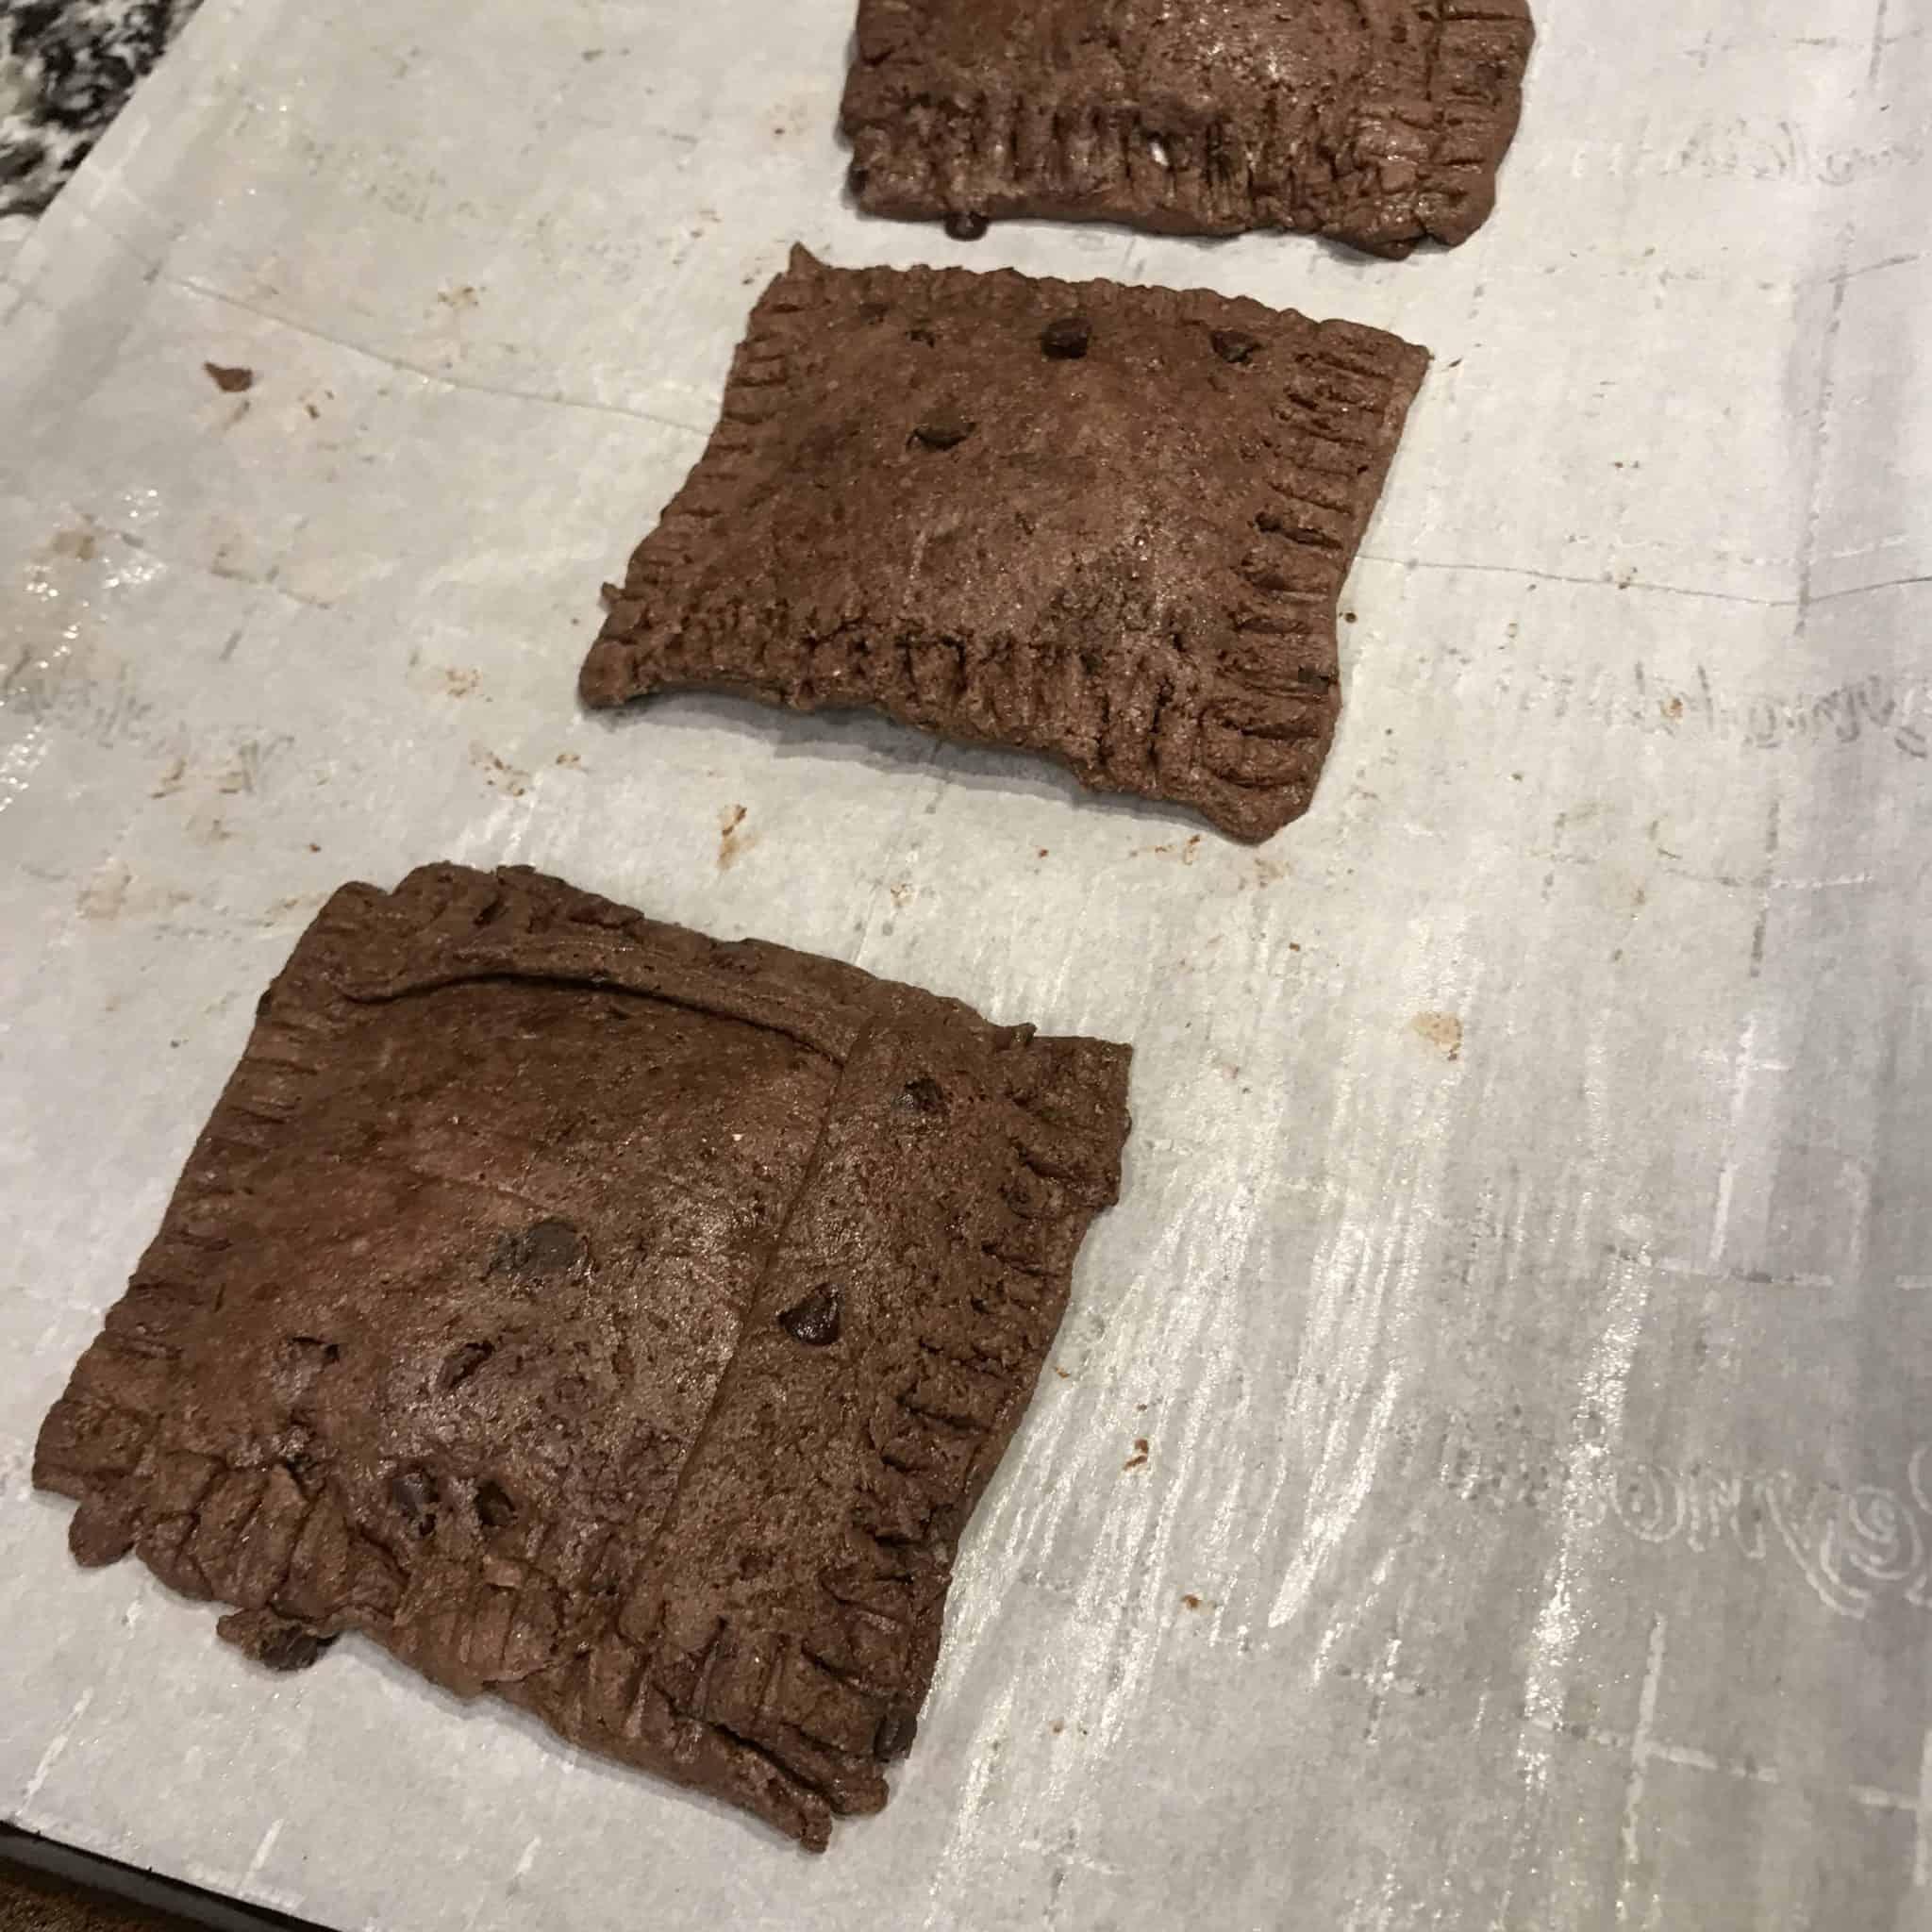 healthy pop tarts before baking